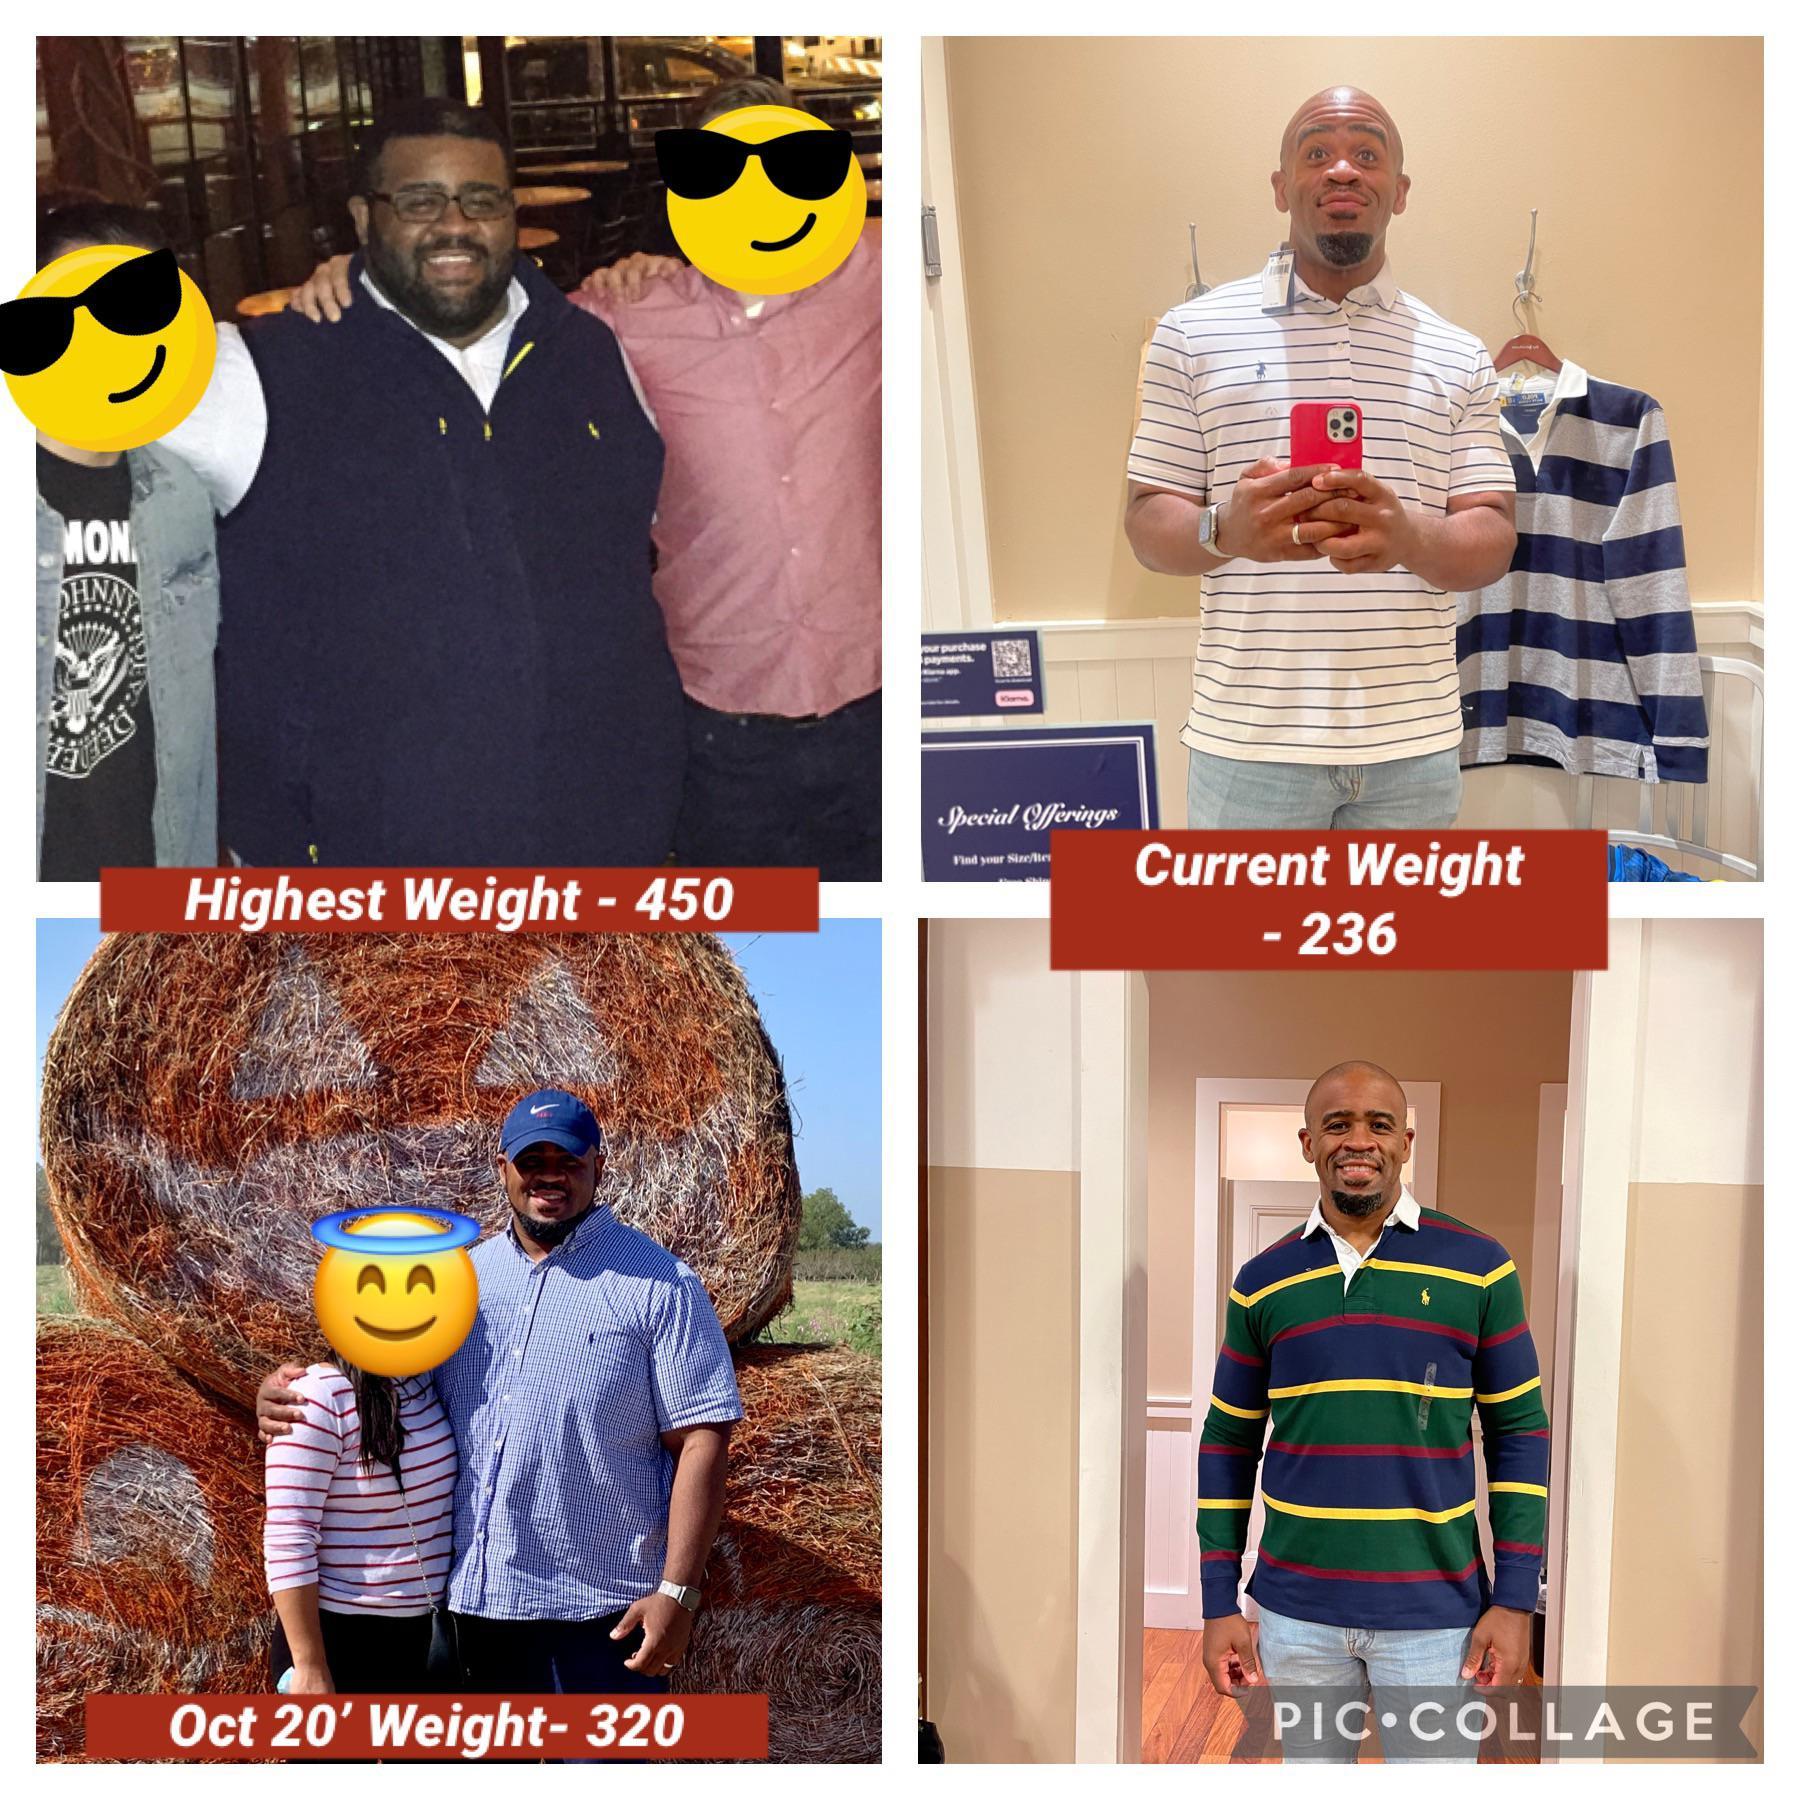 5 foot 11 Male 214 lbs Weight Loss 450 lbs to 236 lbs